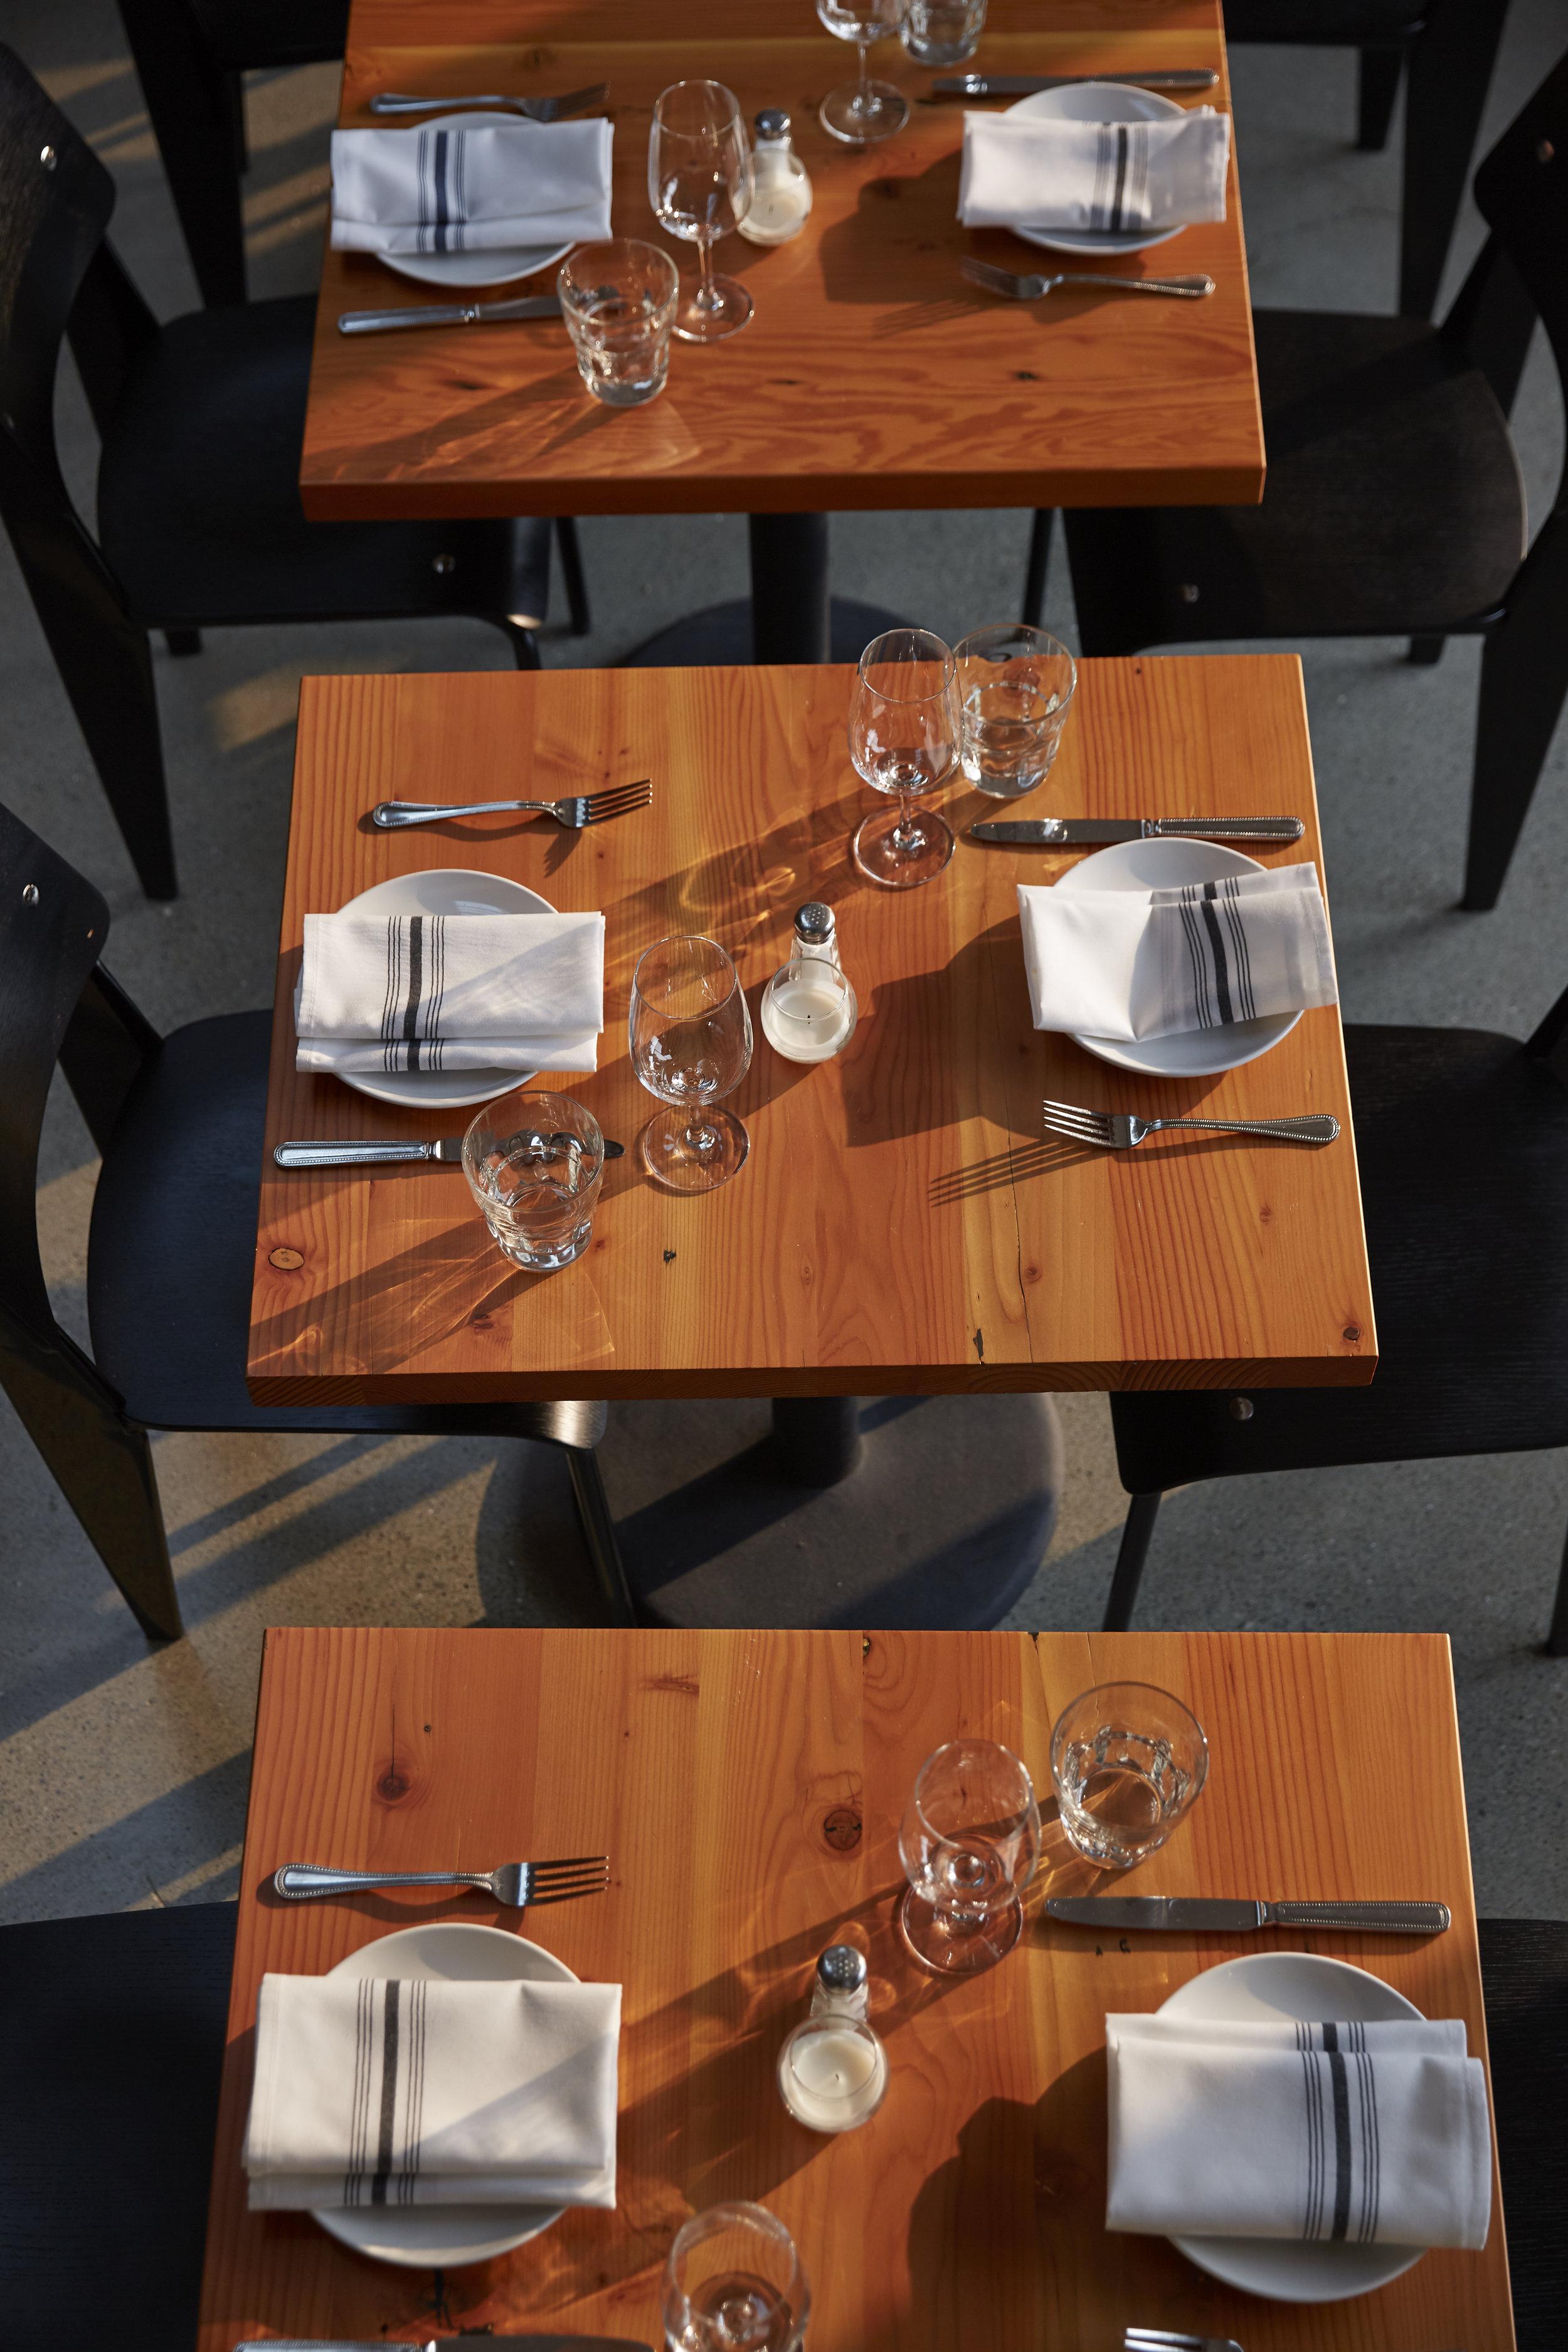 TablesOverhead.jpg